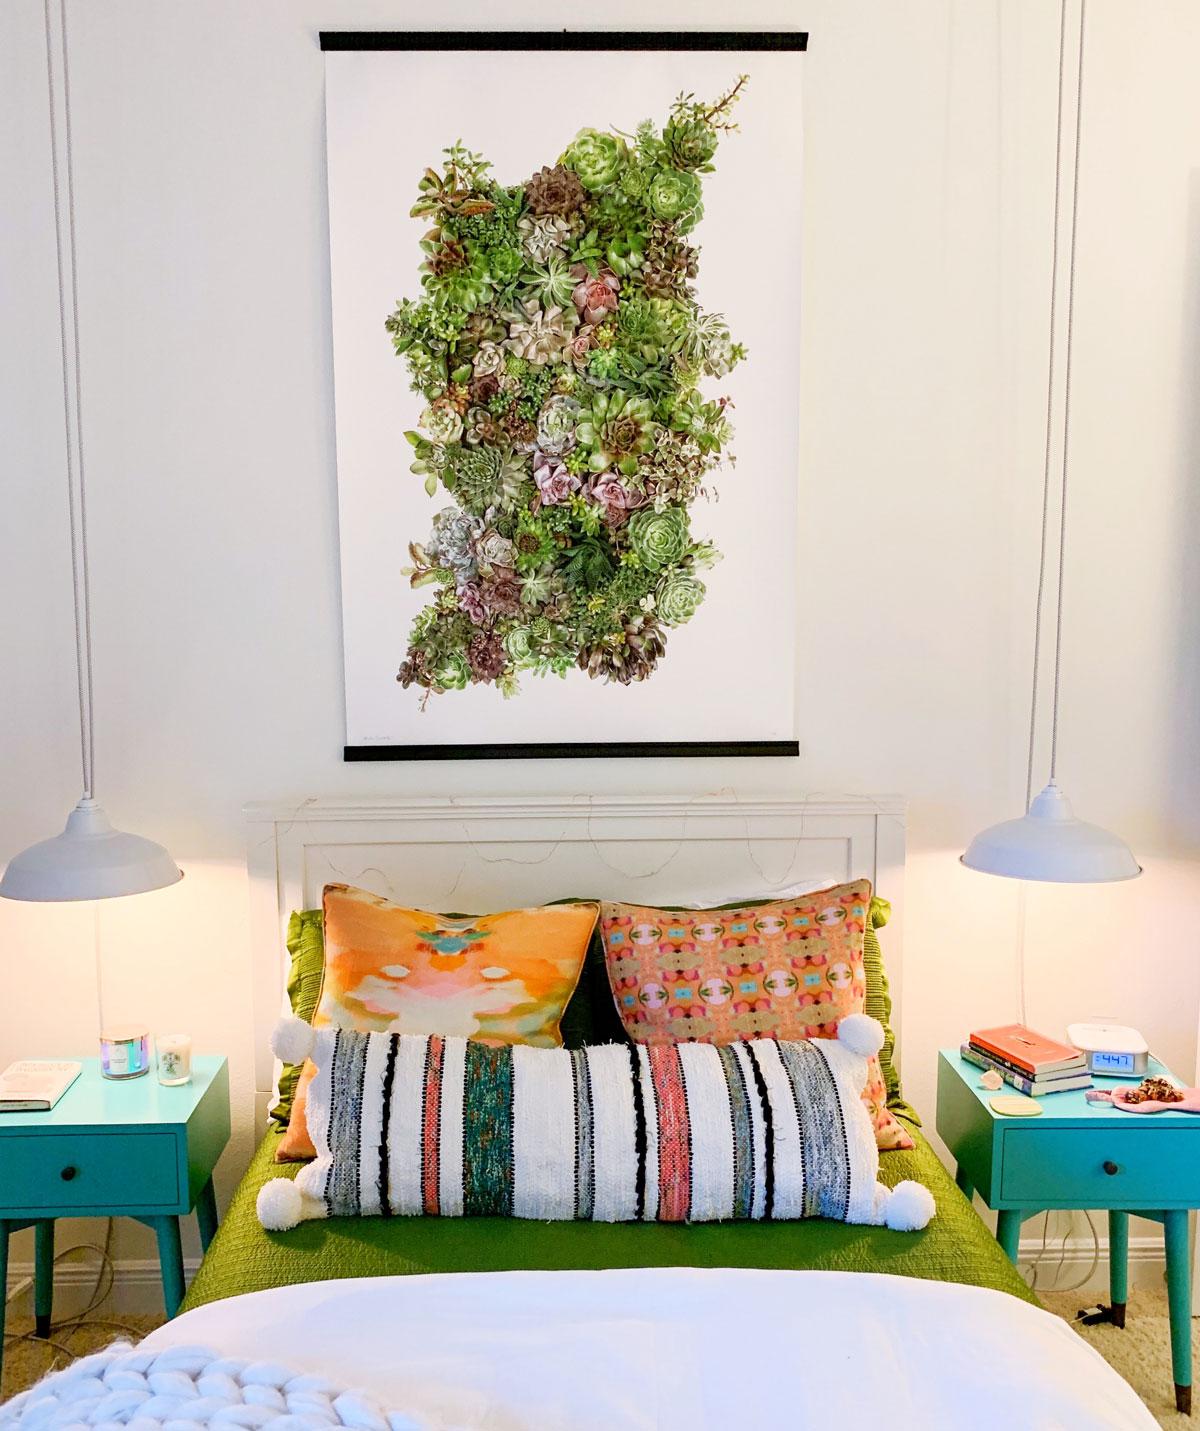 5 Tips for Picking Pillows | Interior Design | Kim Levell